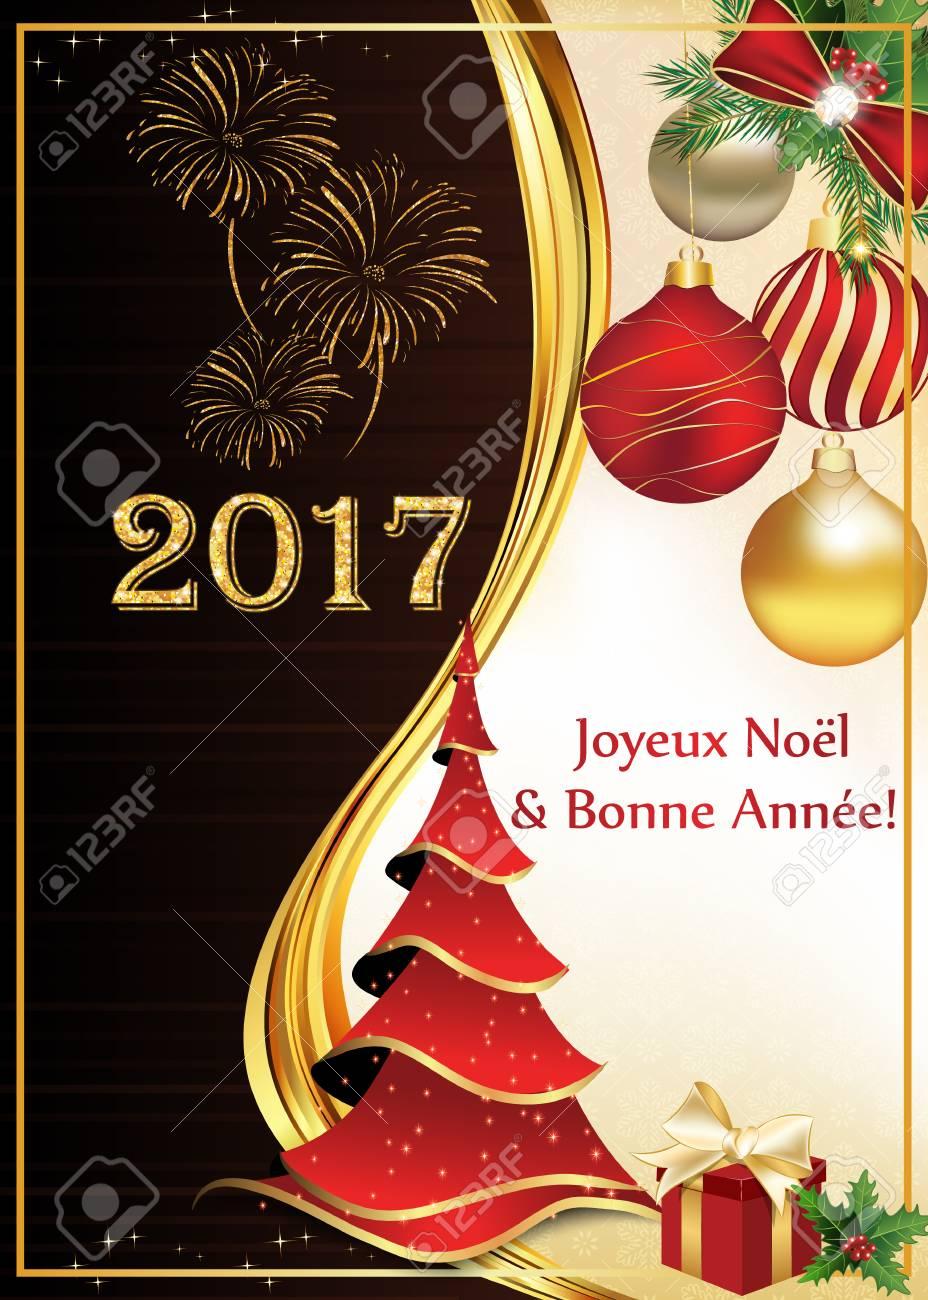 Elegant French Greeting Card For Winter Season 2017 French Wish